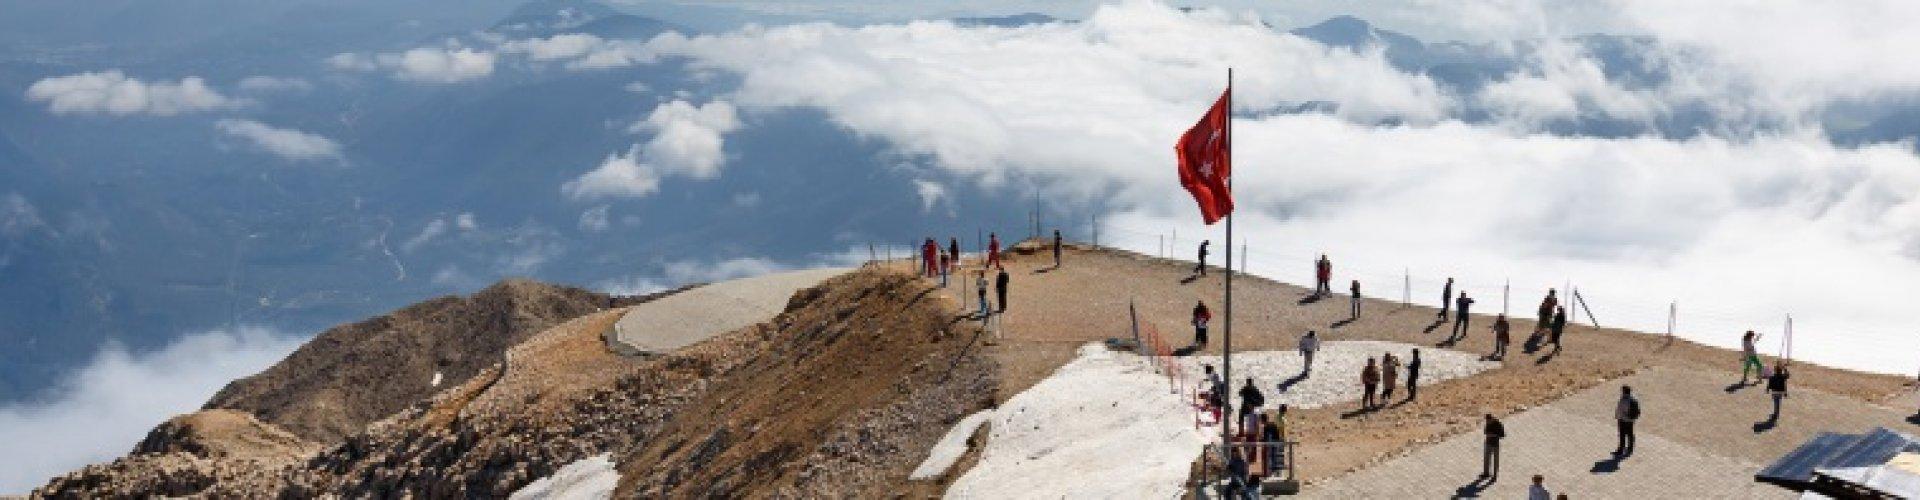 Berg Tahtali & Seilbahn Seat to Sky